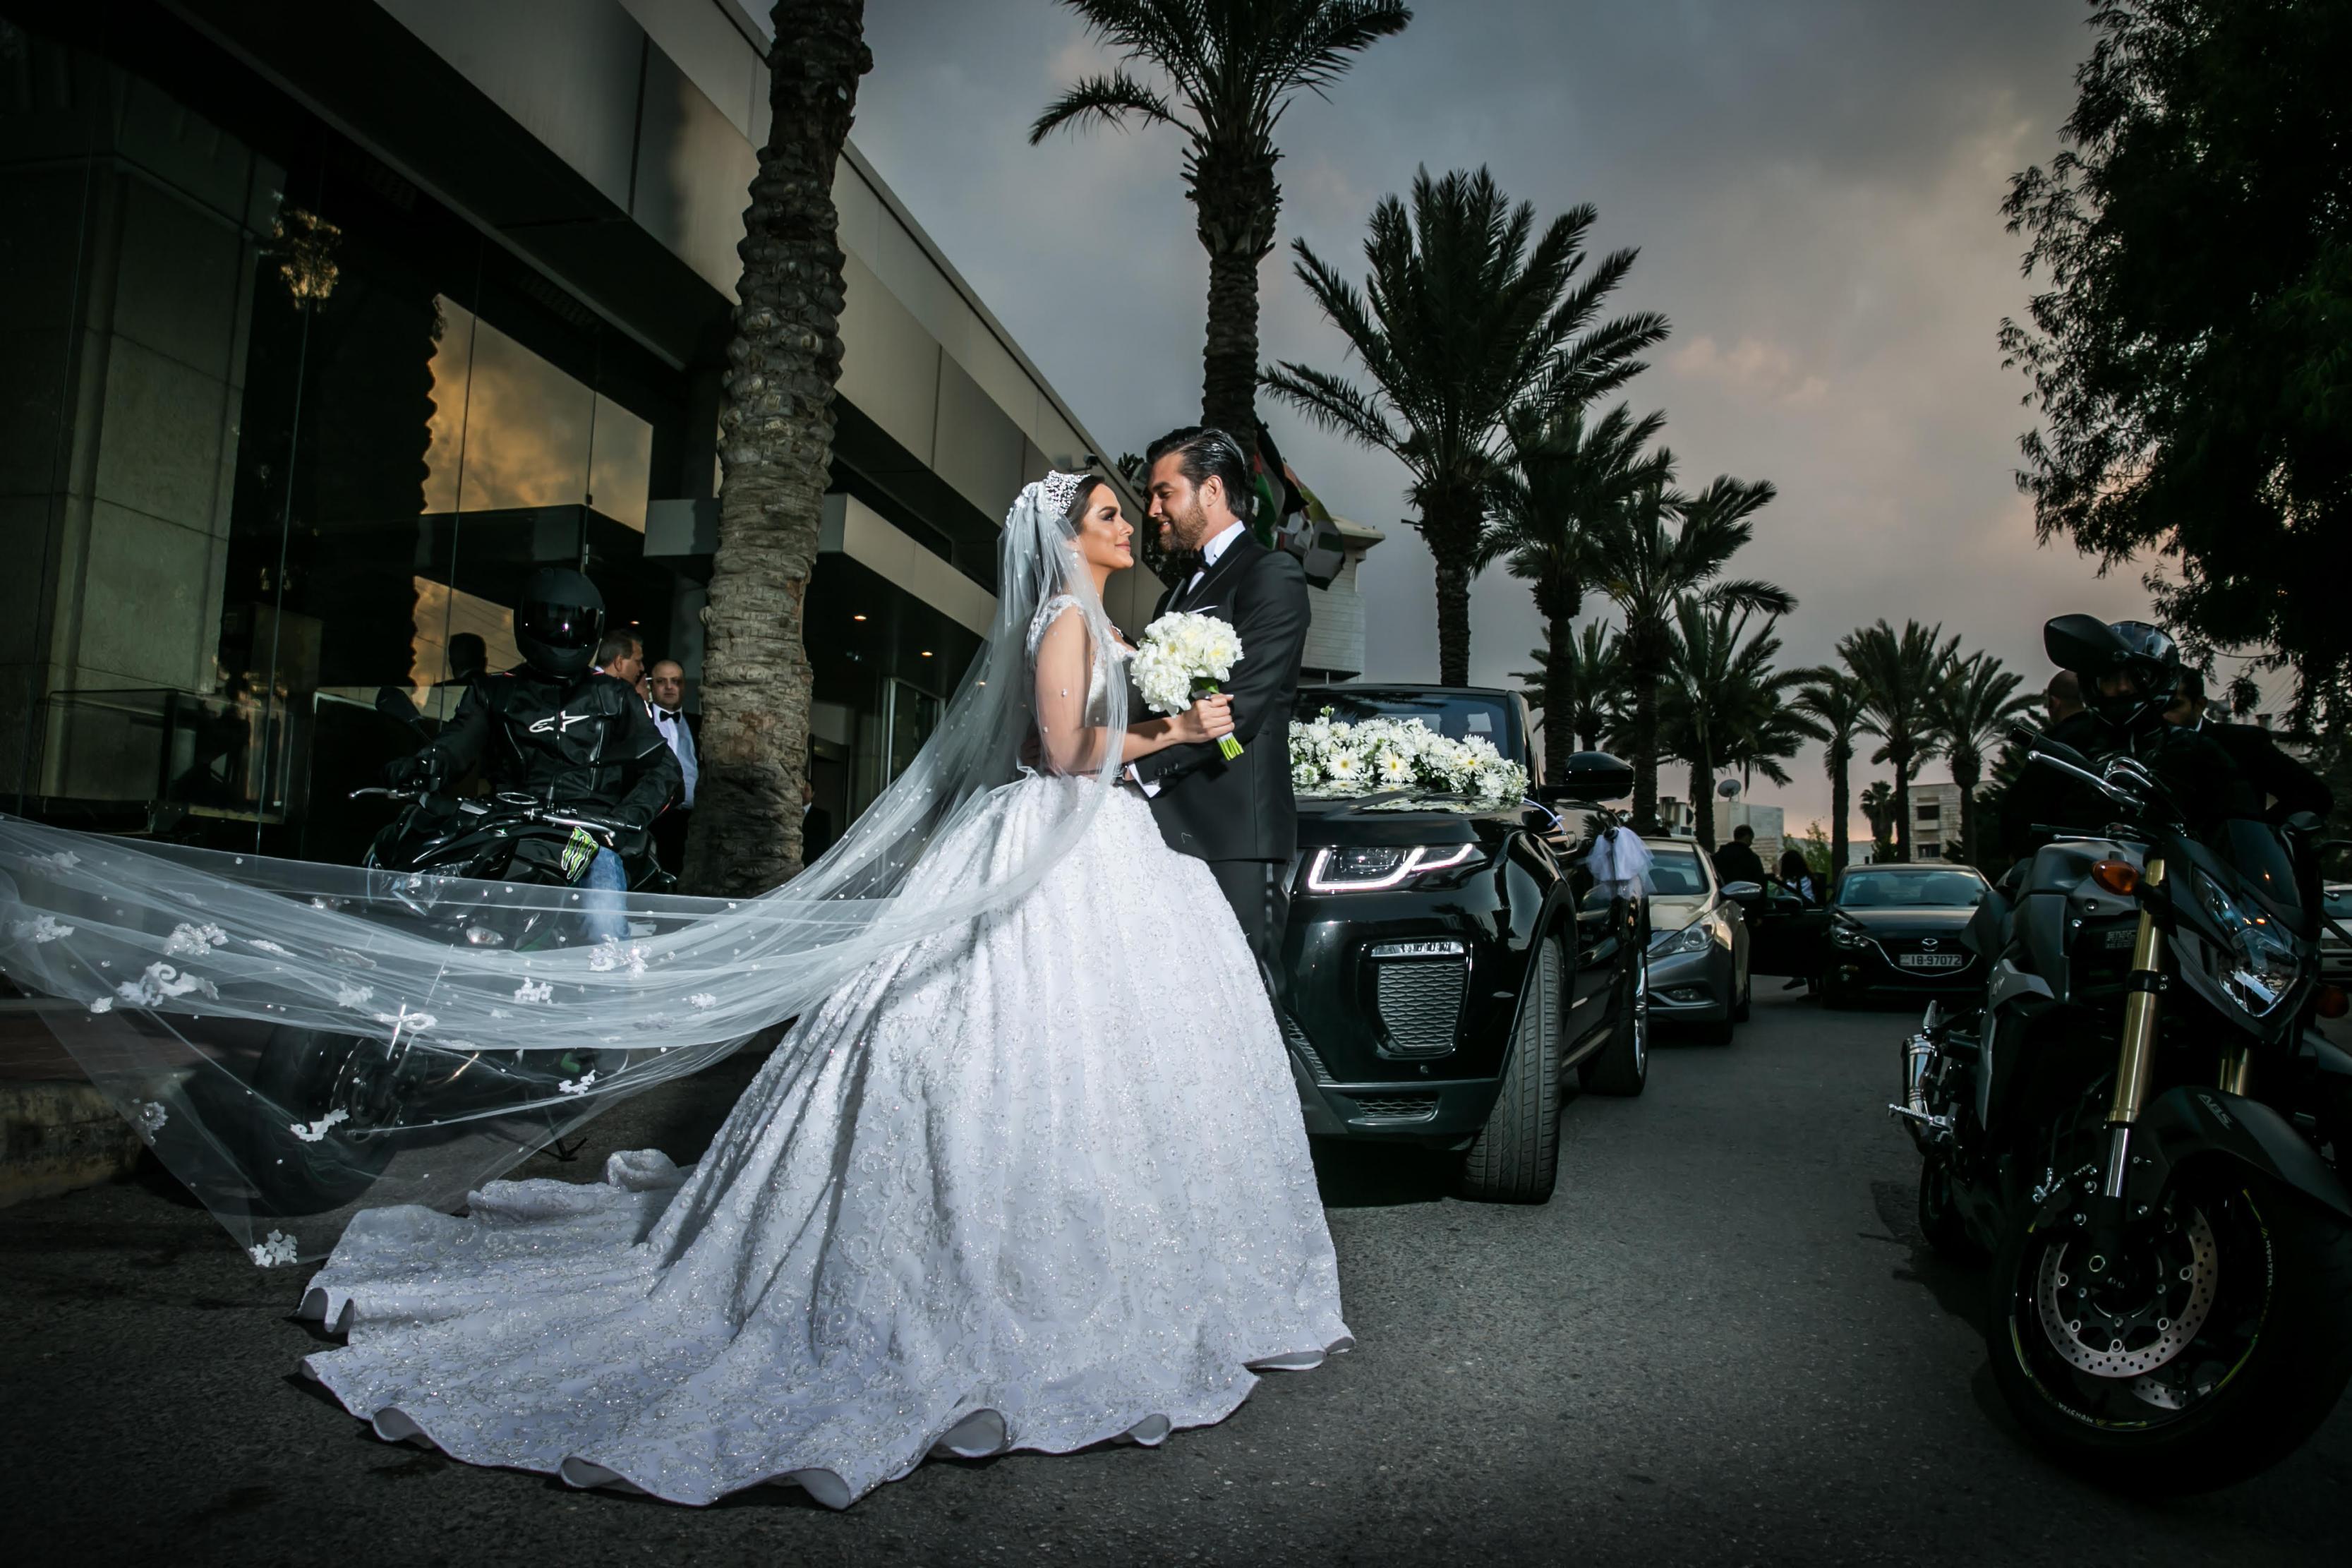 بالصور اجمل صور عرسان , شاهد بالصور اجمل البومات الصور للعرسان 430 8